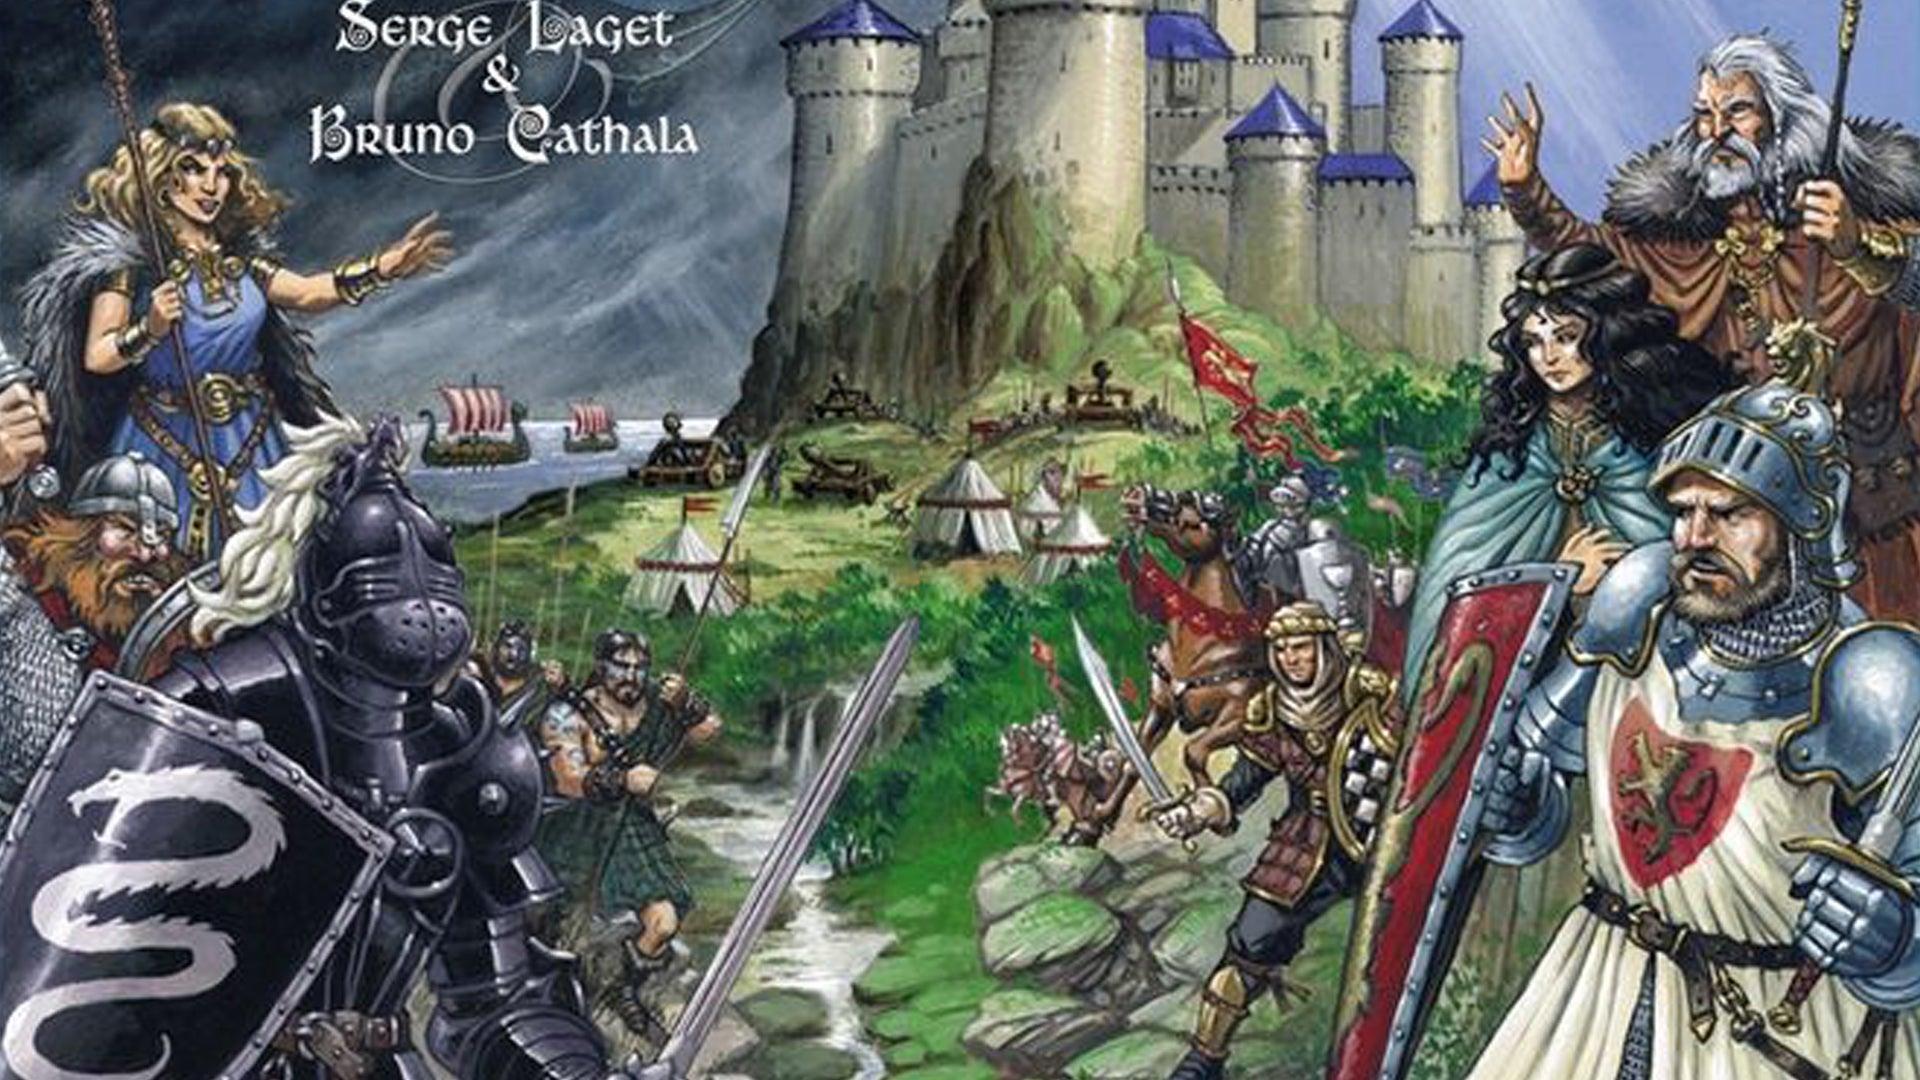 Shadows Over Camelot board game artwork